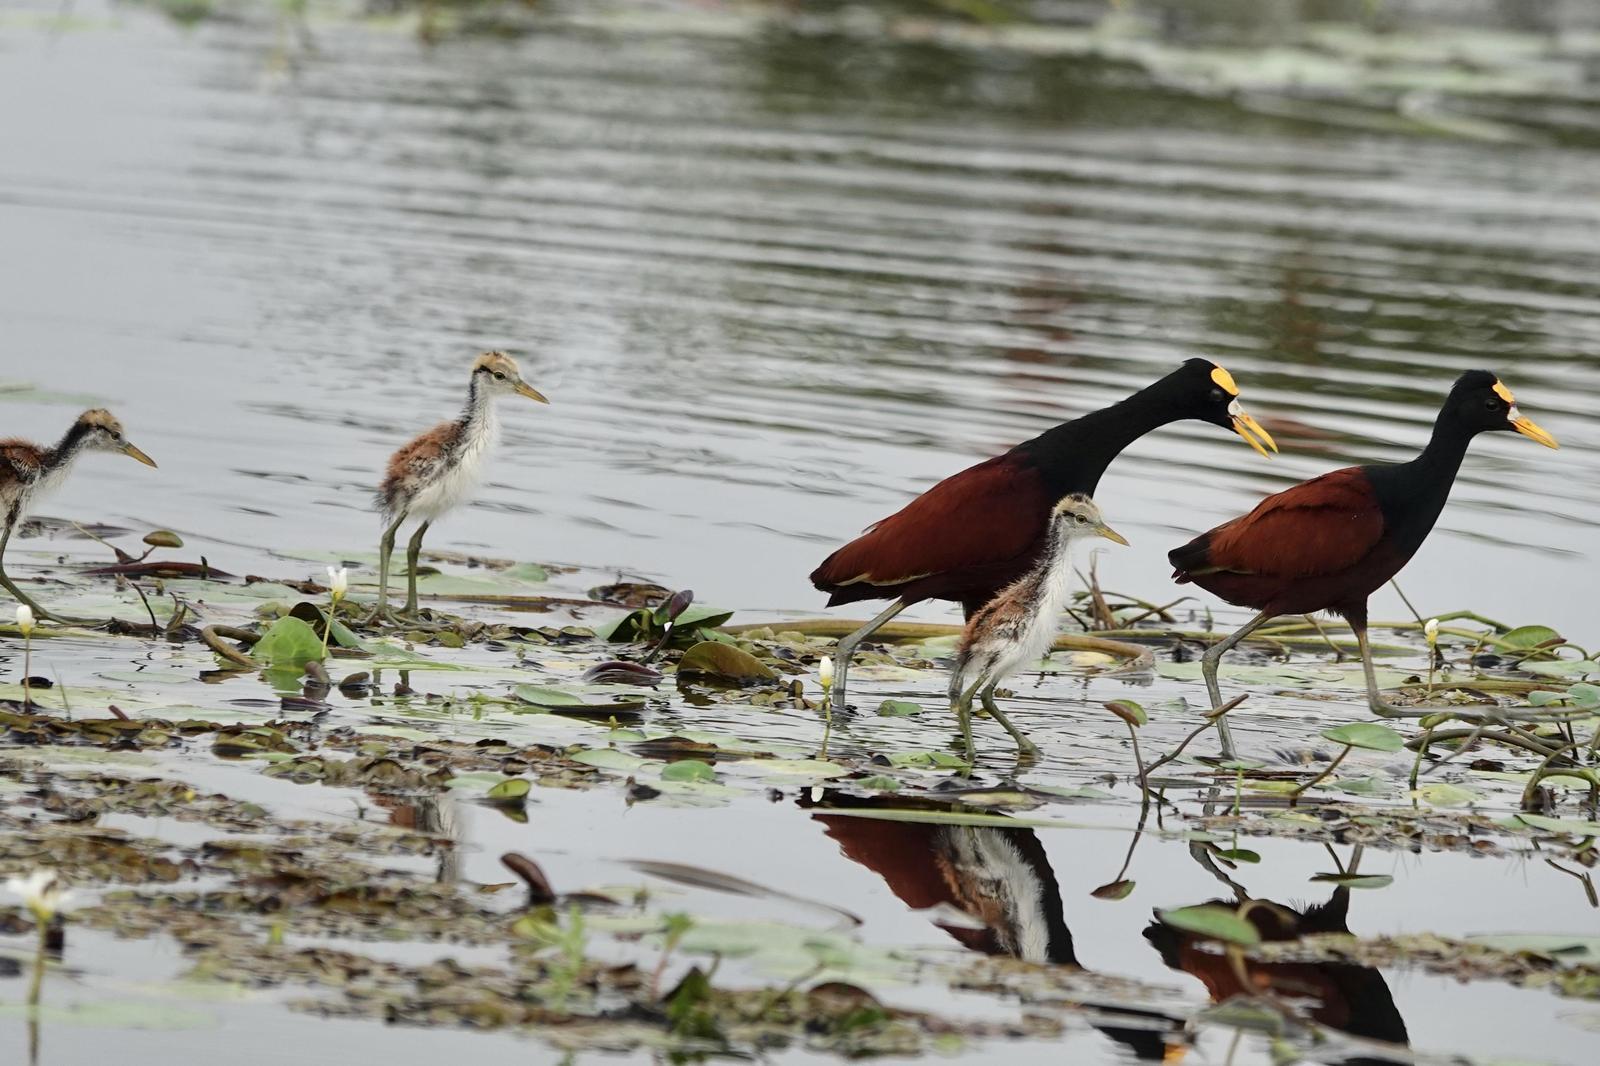 Northern Jacana Photo by Bonnie Clarfield-Bylin